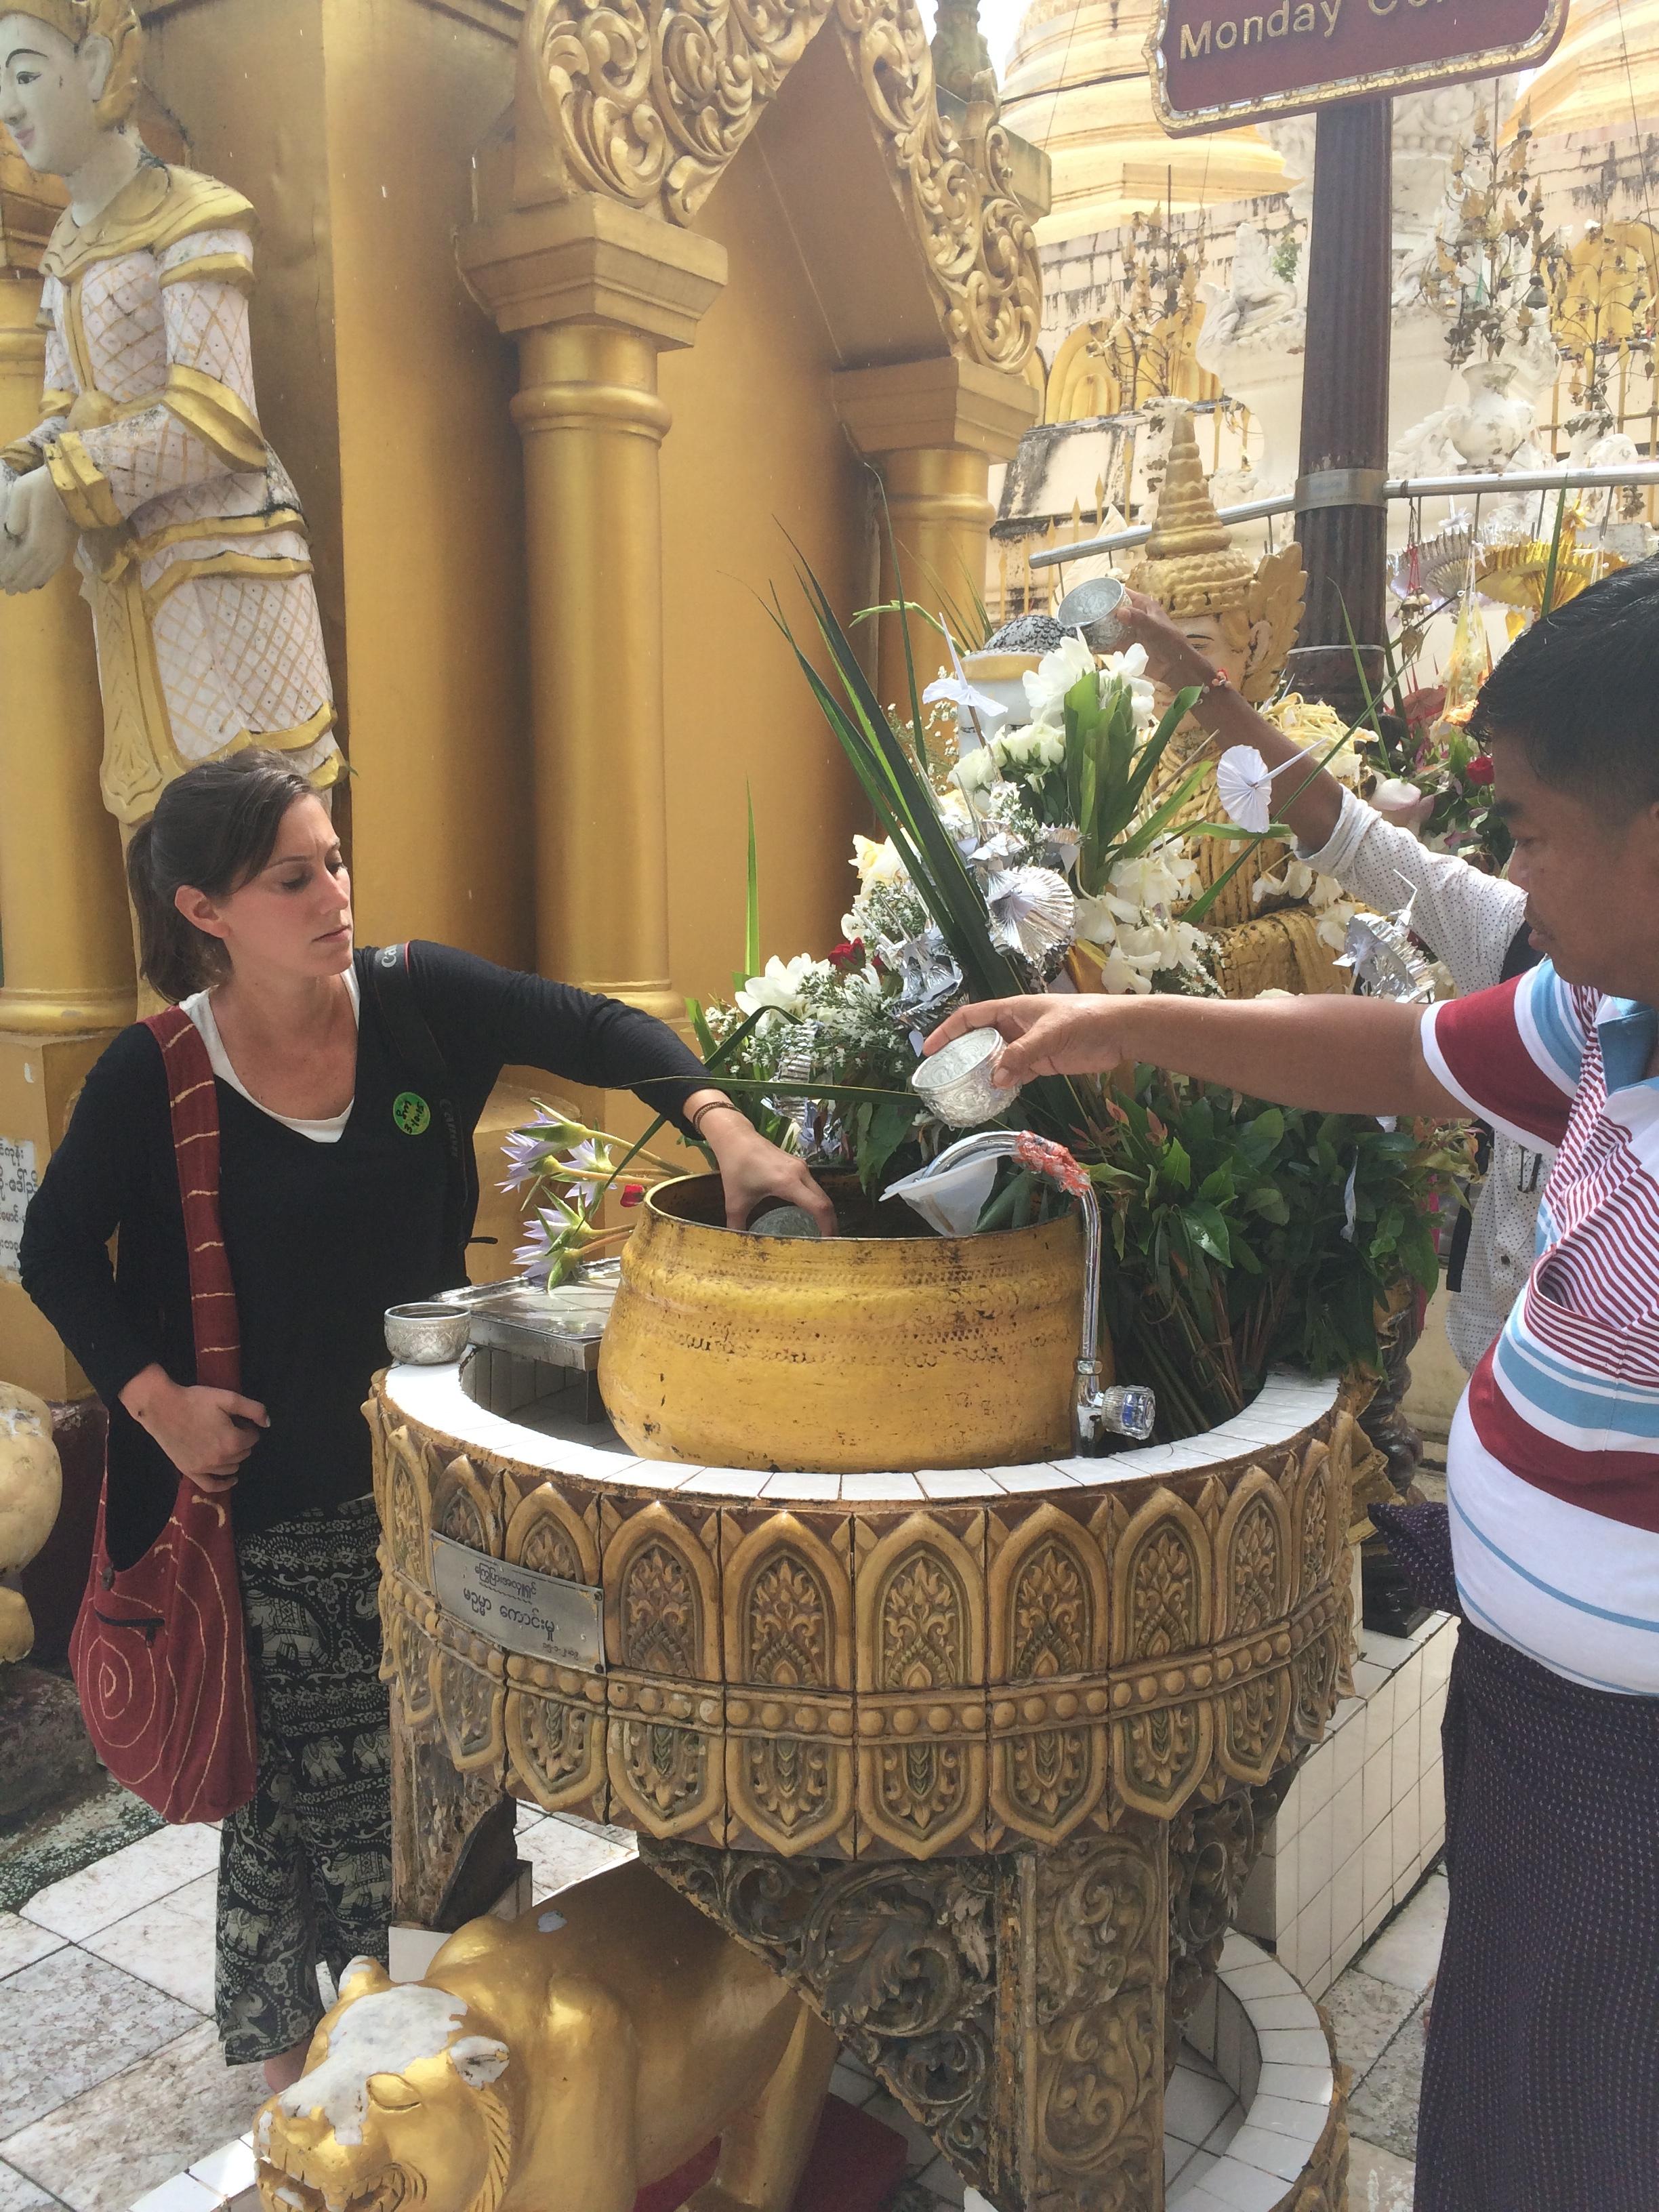 Partaking in rituals at Shwedagon Pagoda in Yangon, Myanmar